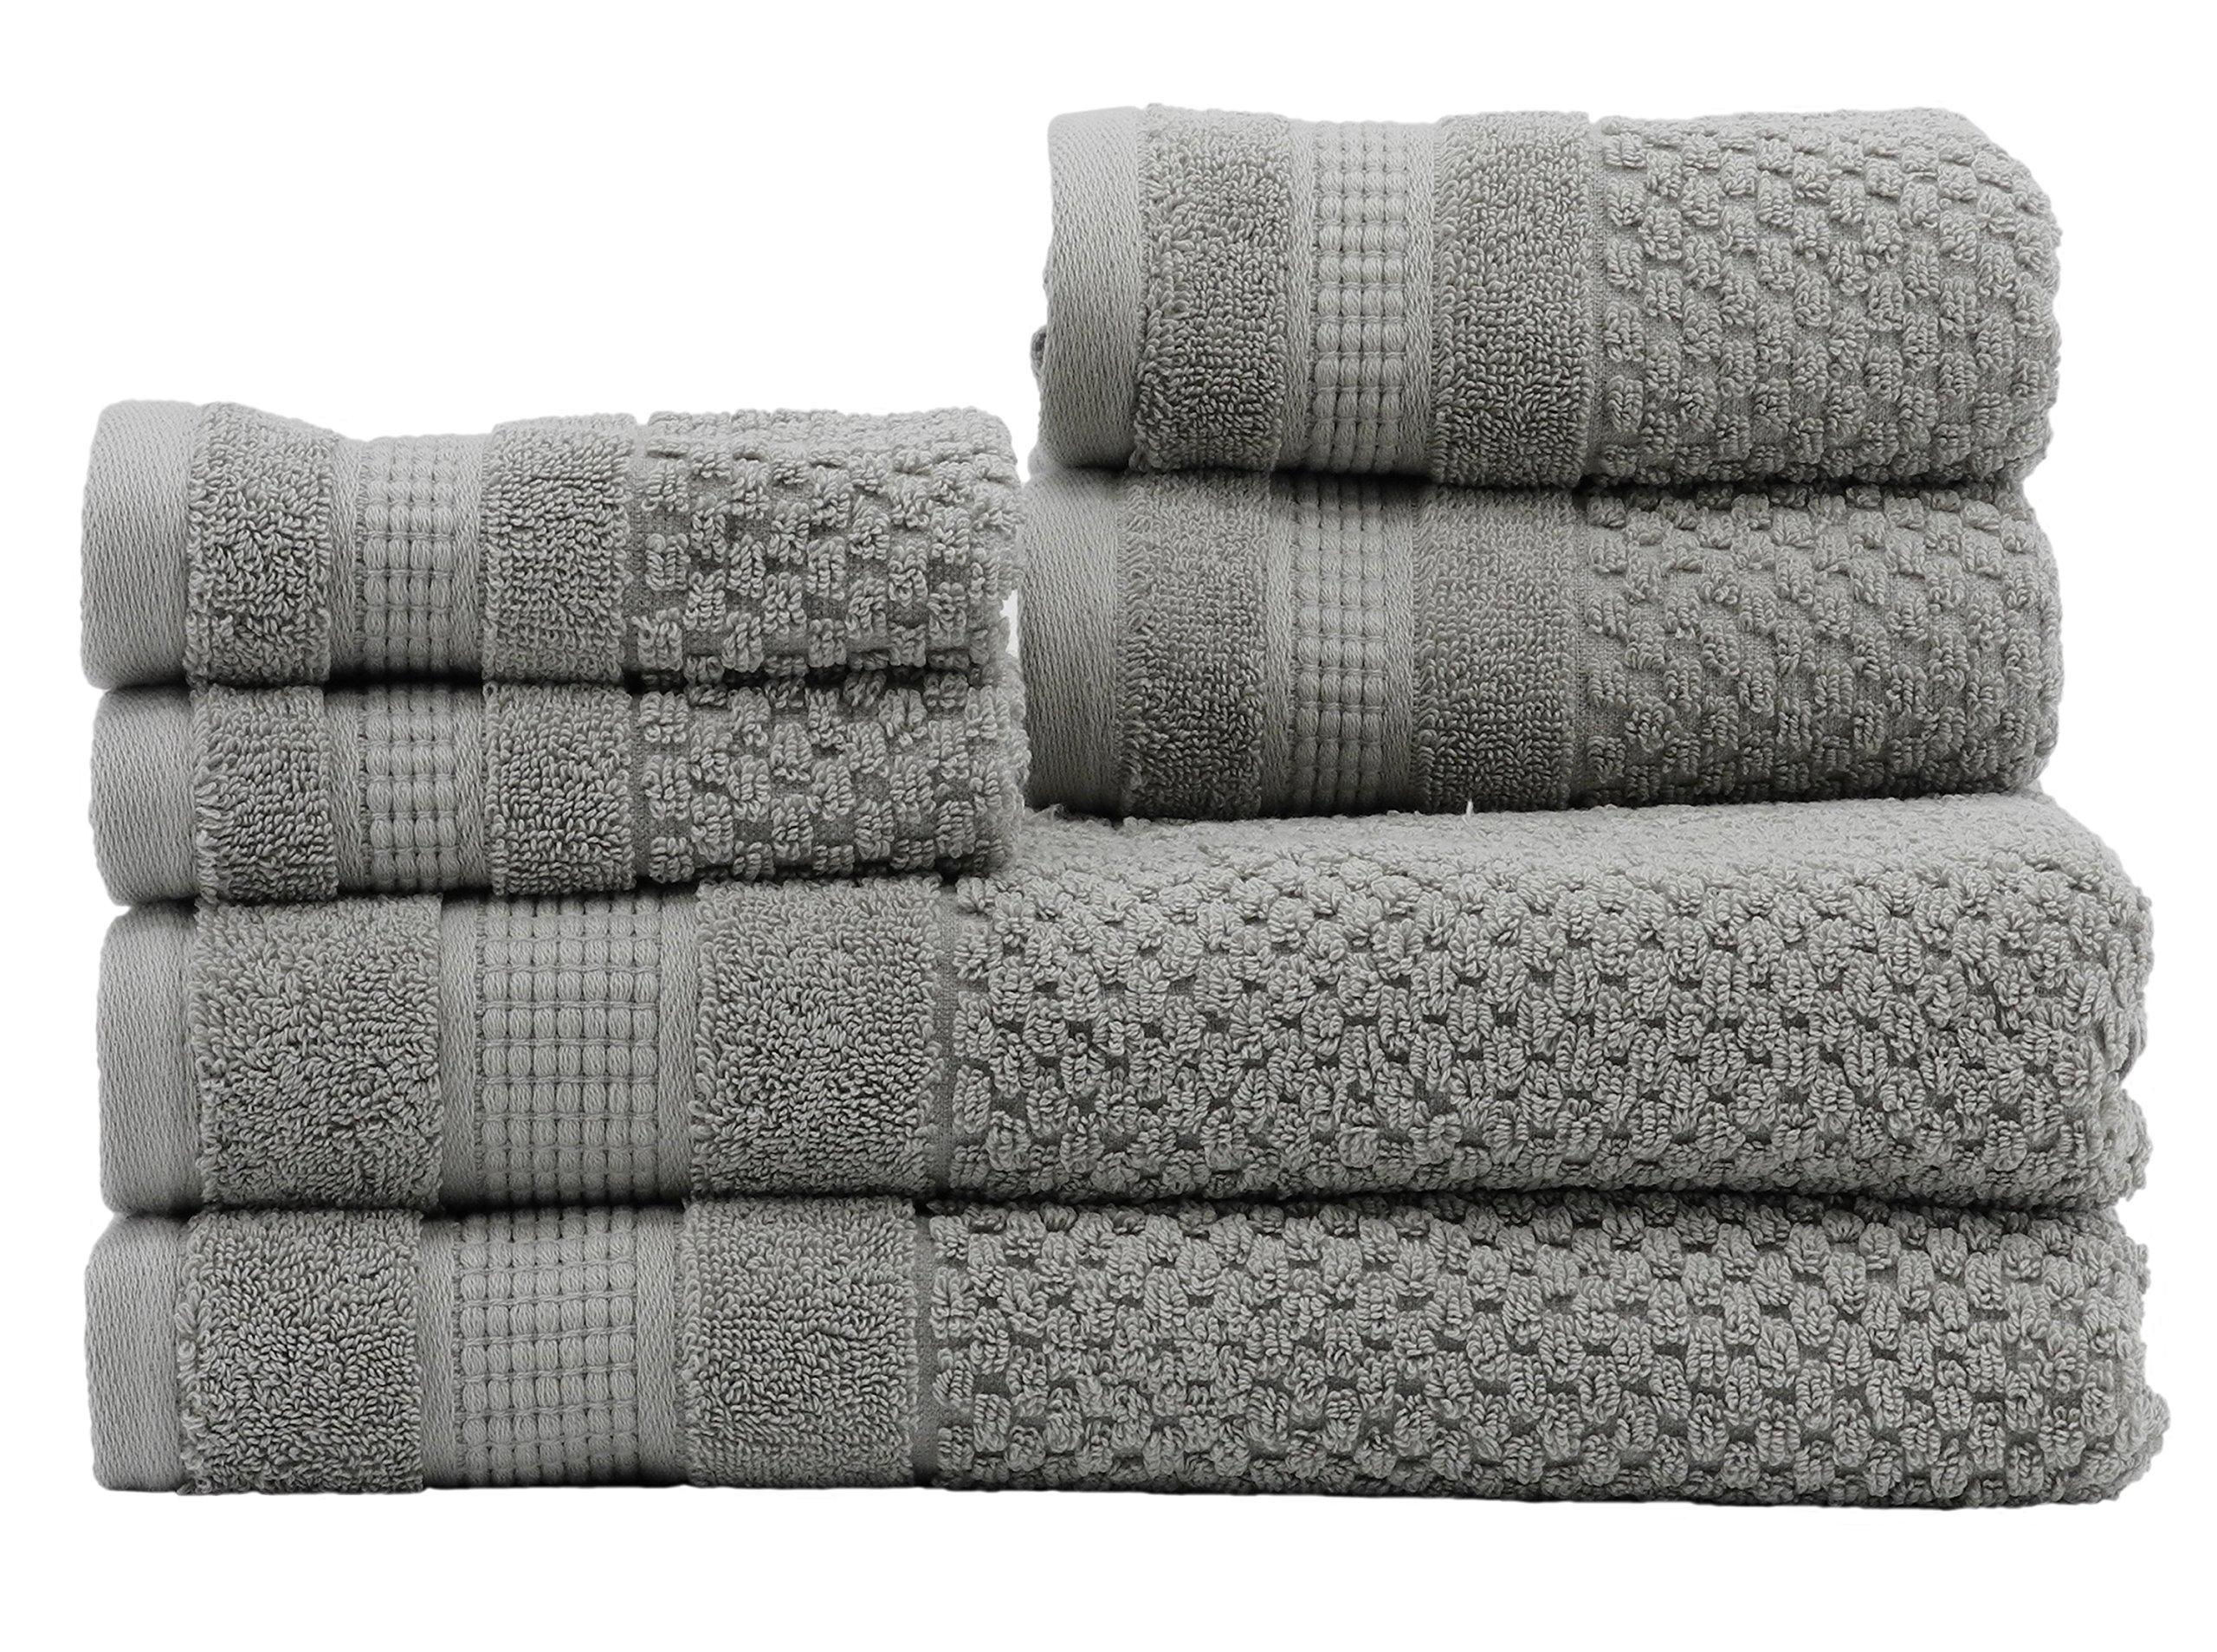 Caro Home Pebble 6 Piece Bath Towel Set, Large, Nickel